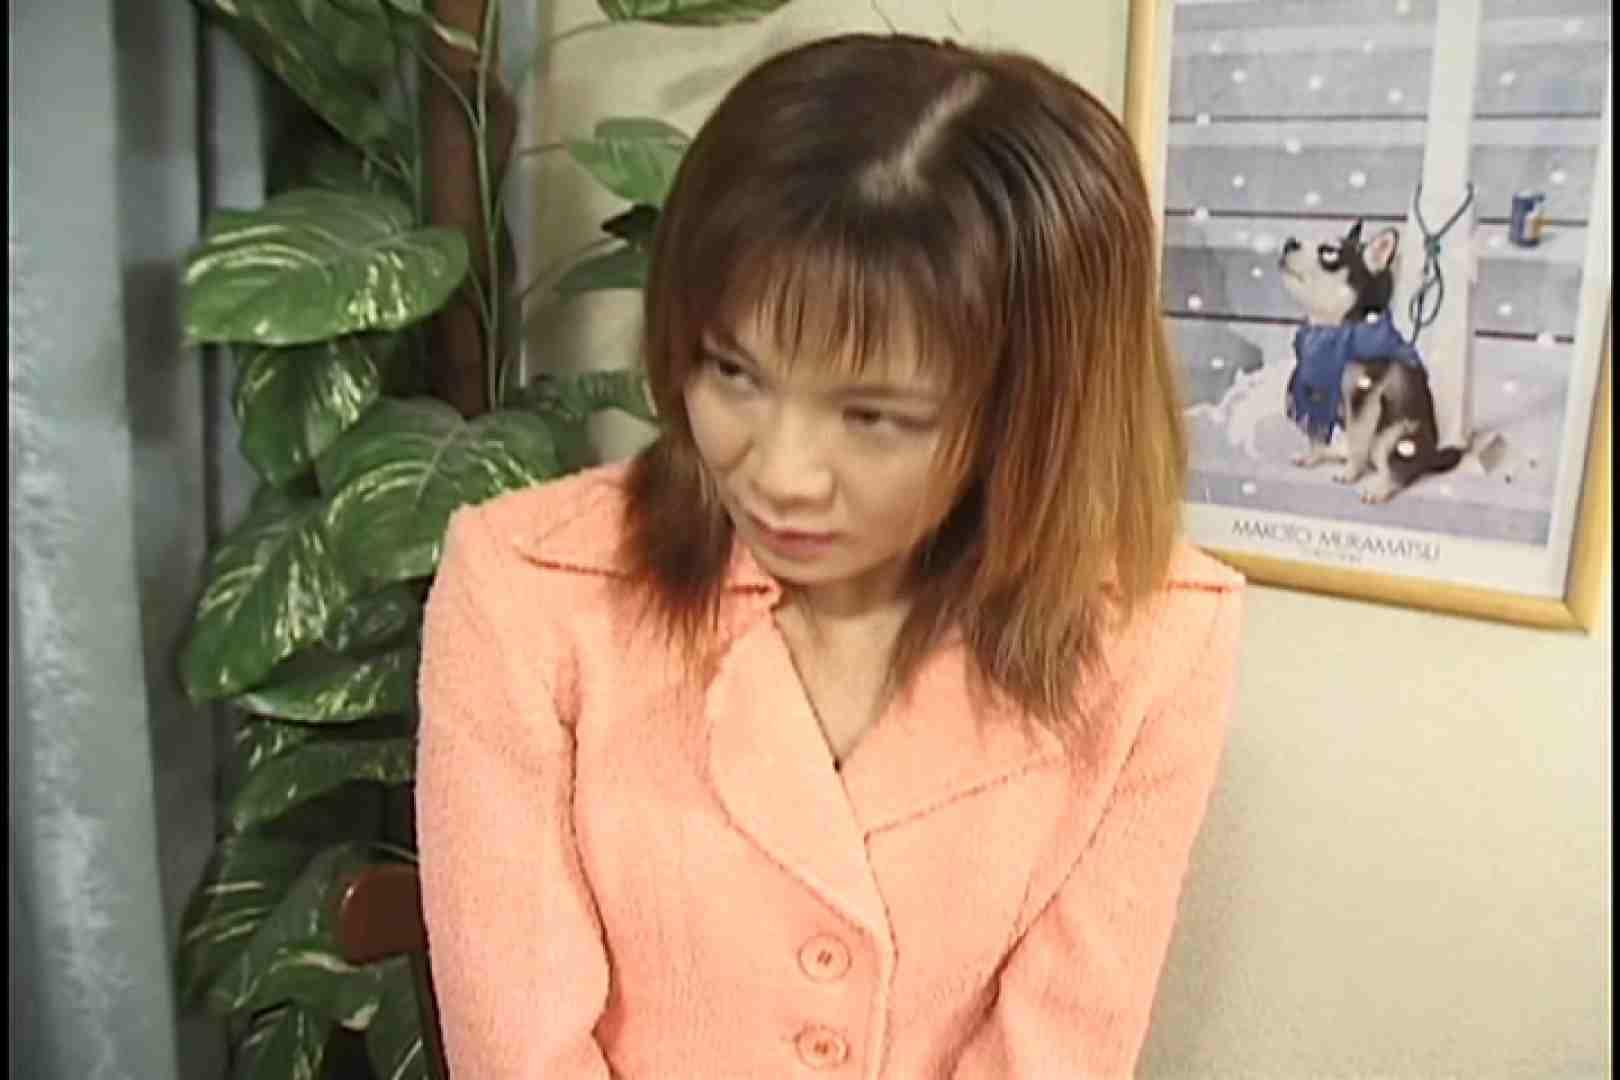 昼間の奥様は欲求不満 ~桜井昌子~ フェラ SEX無修正画像 60連発 14